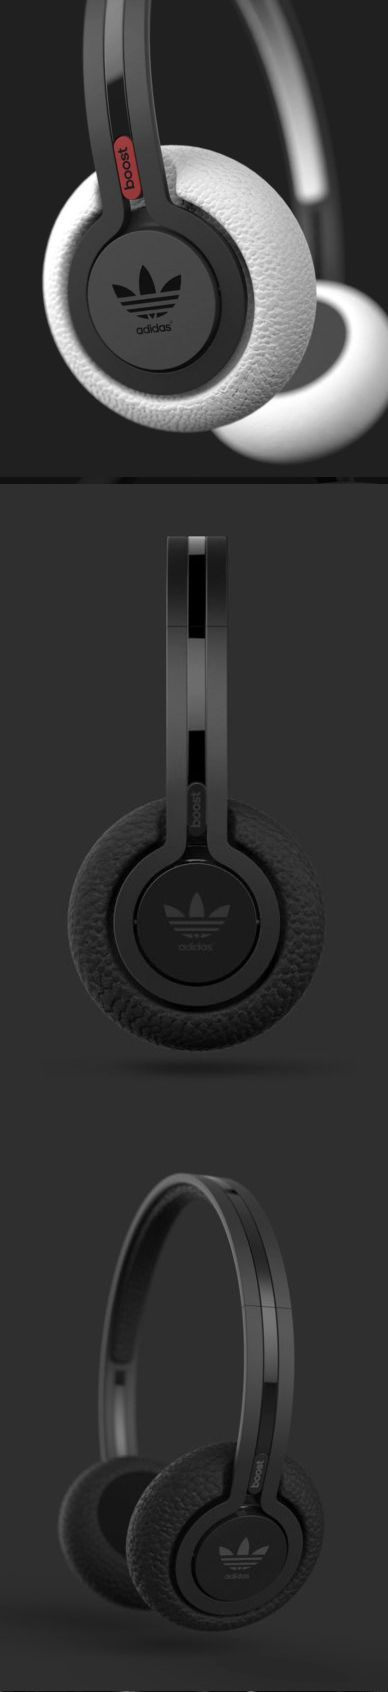 #Adidas #Black #Color #Accent #Ergonomics #Headphones #Matte #Polystyrene #White